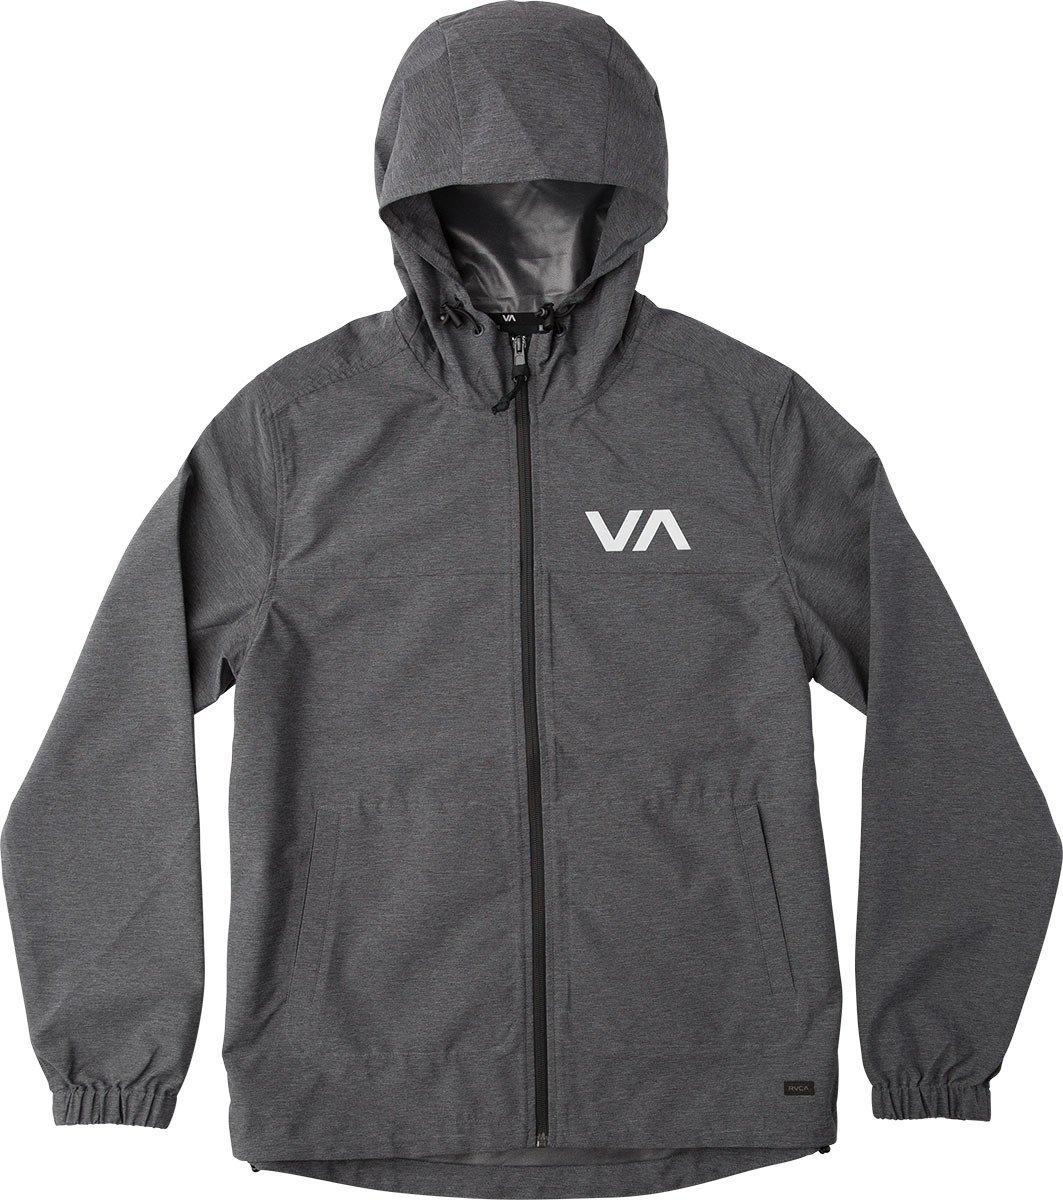 RVCA Men's Steep Sport Jacket, Black, Large by RVCA (Image #1)